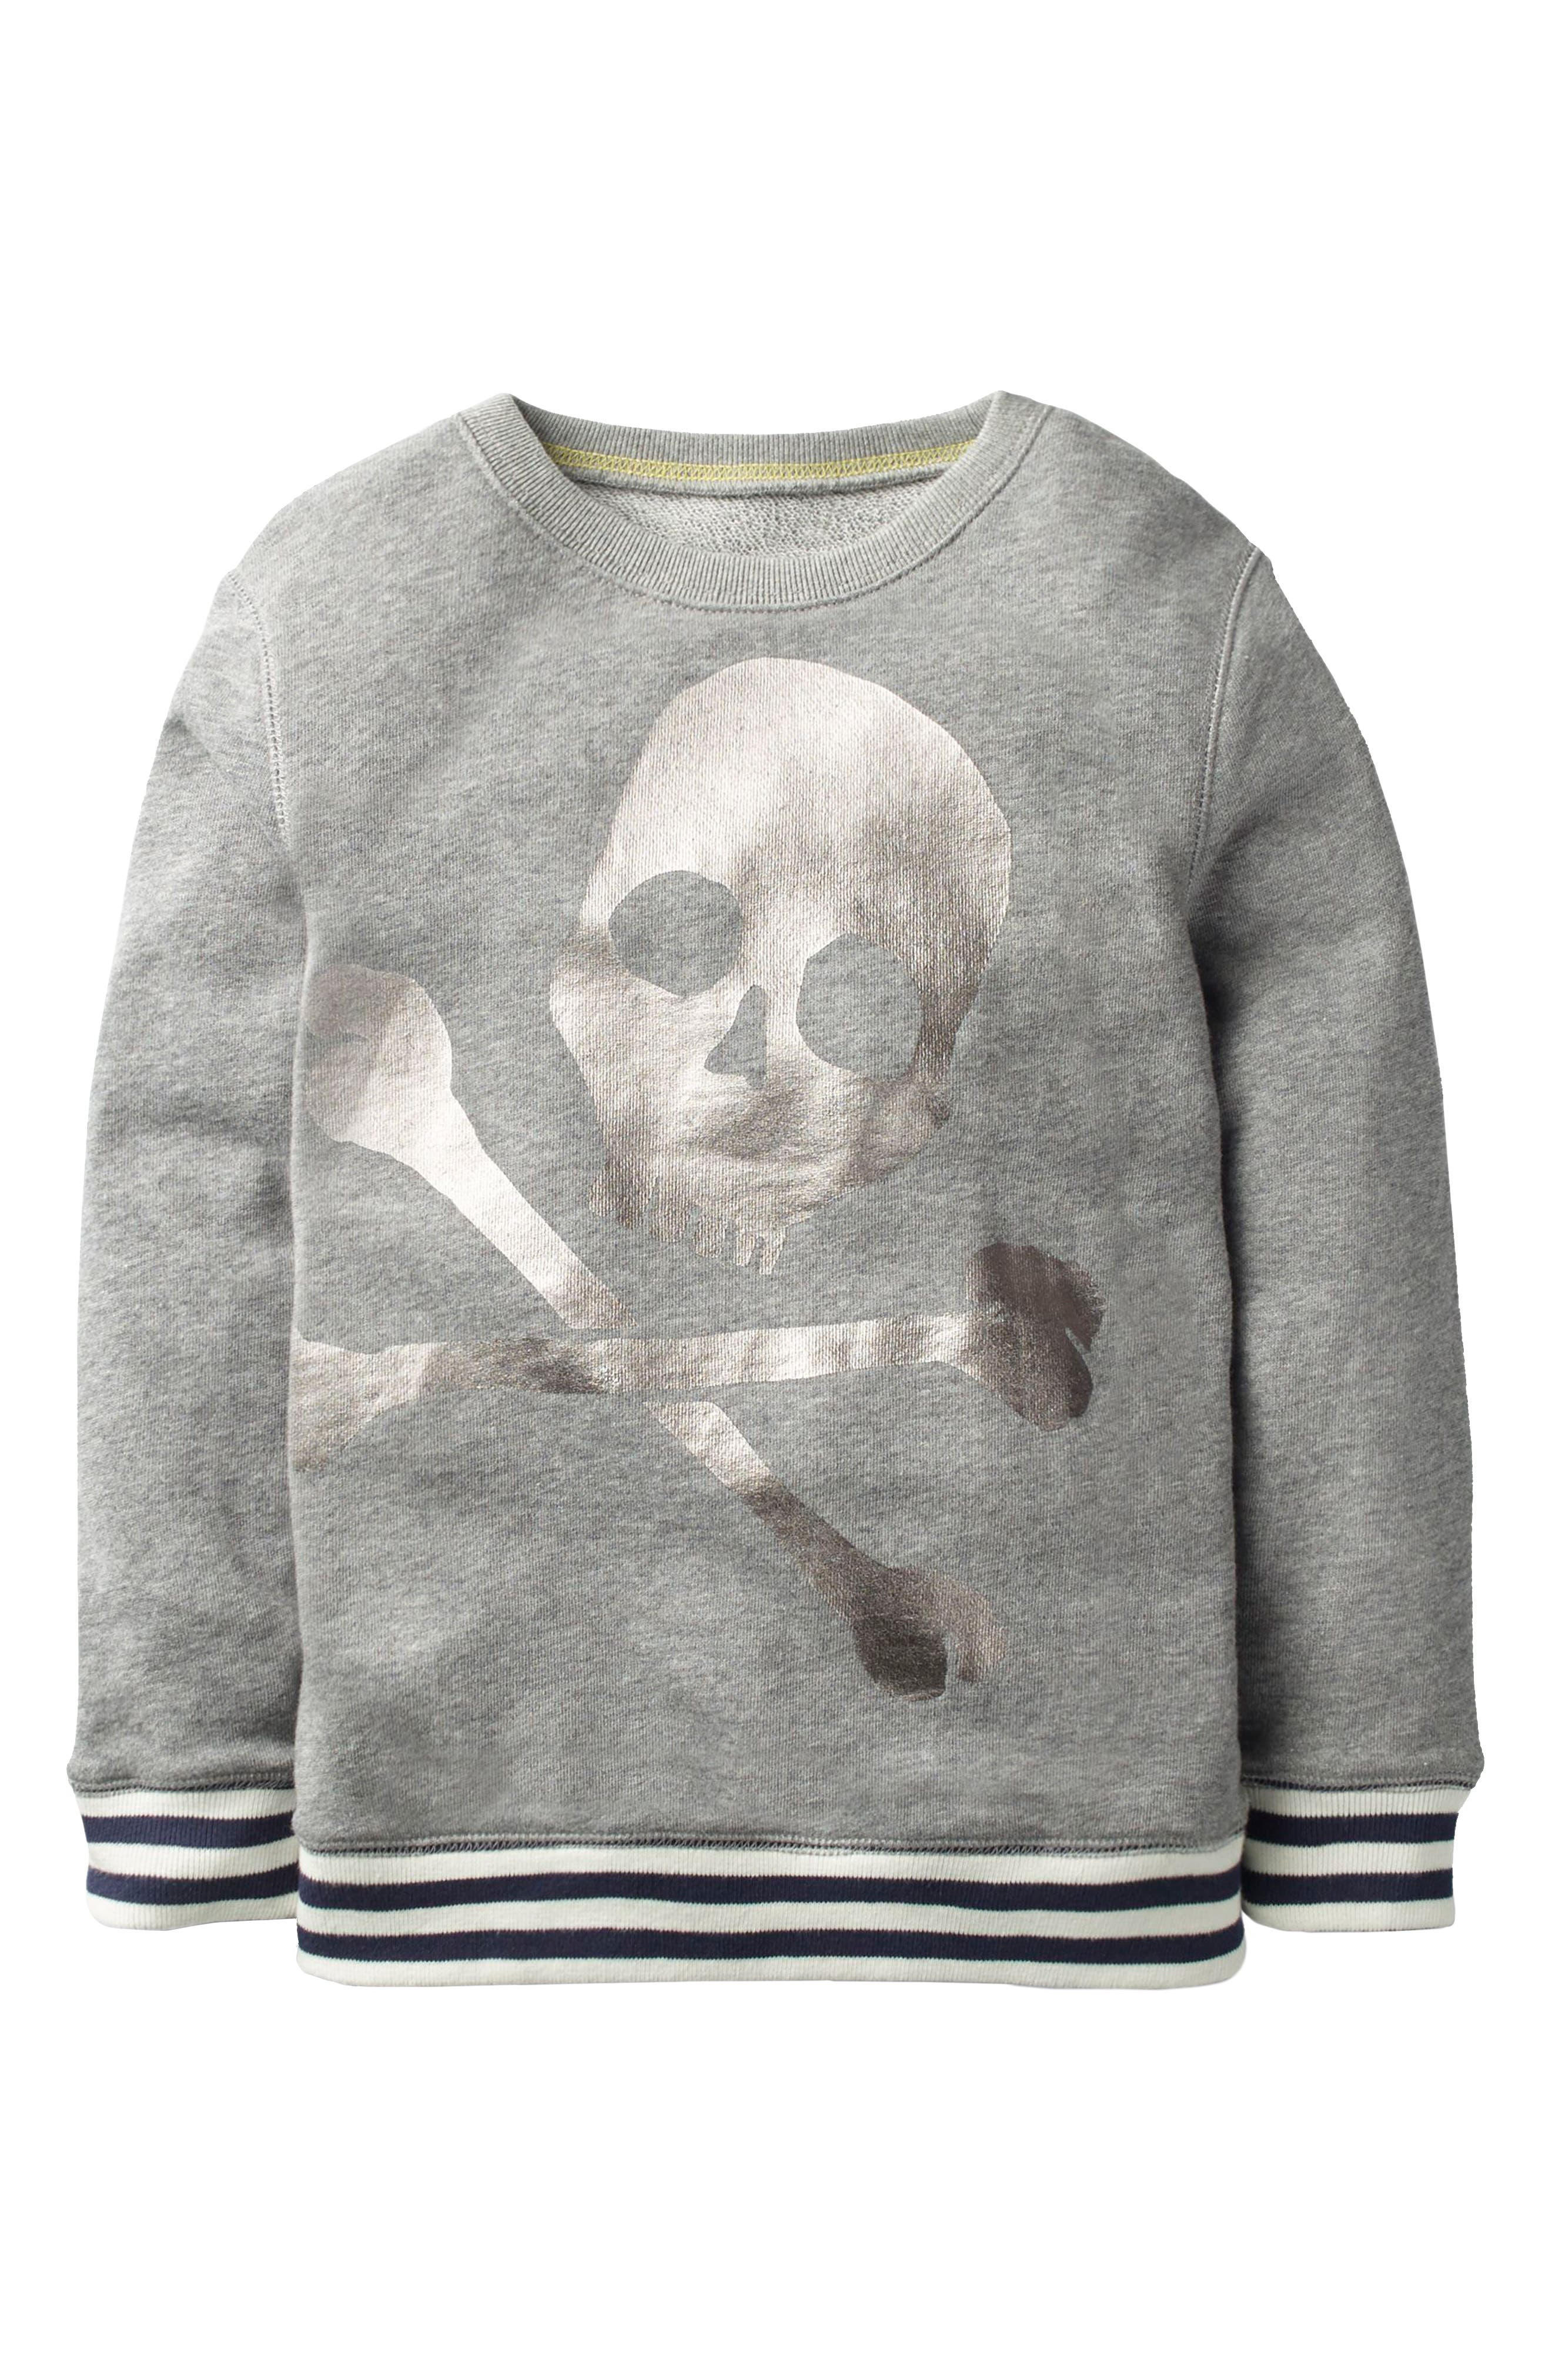 Fun Skull Sweatshirt,                         Main,                         color, 034